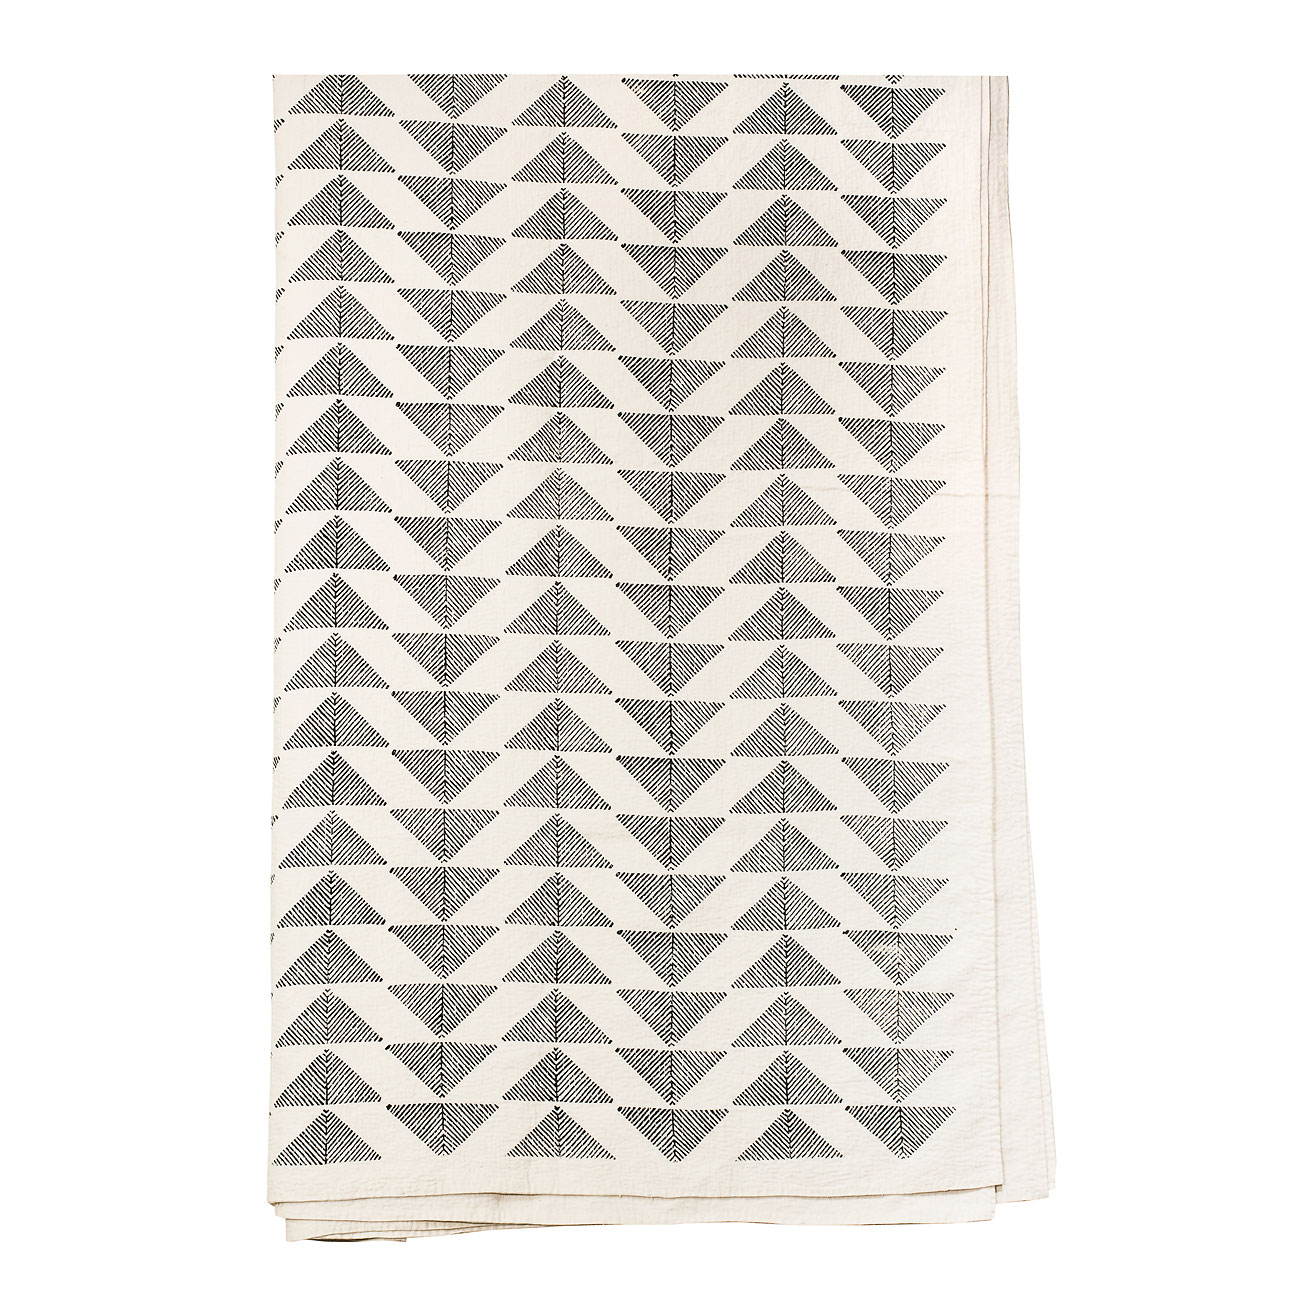 Pyramid Överkast 250x270 cm, Svart/Vit